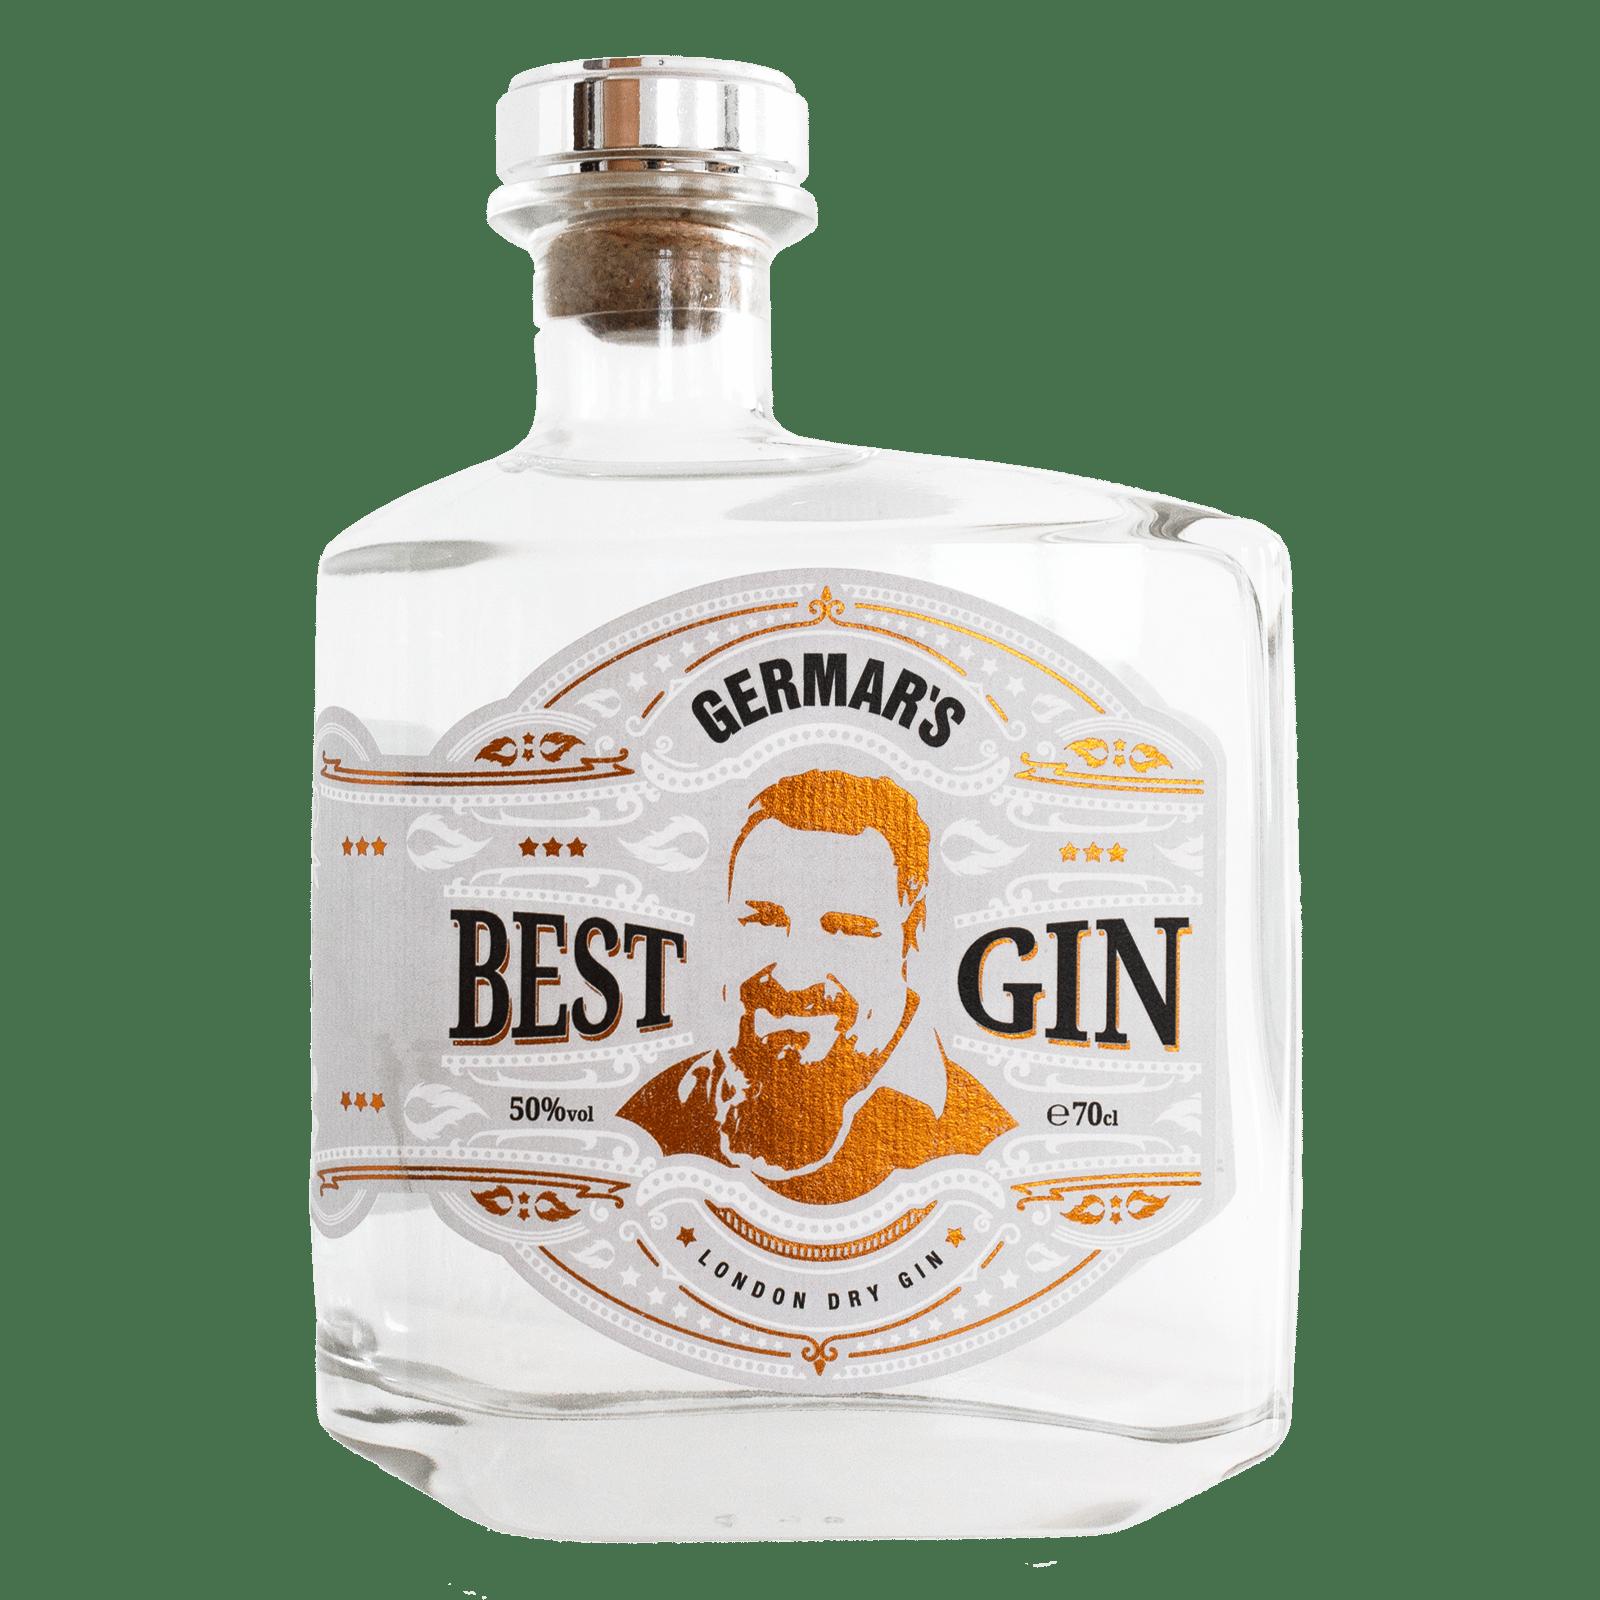 Germars-Gin-Mockup-Shop-1600×1600